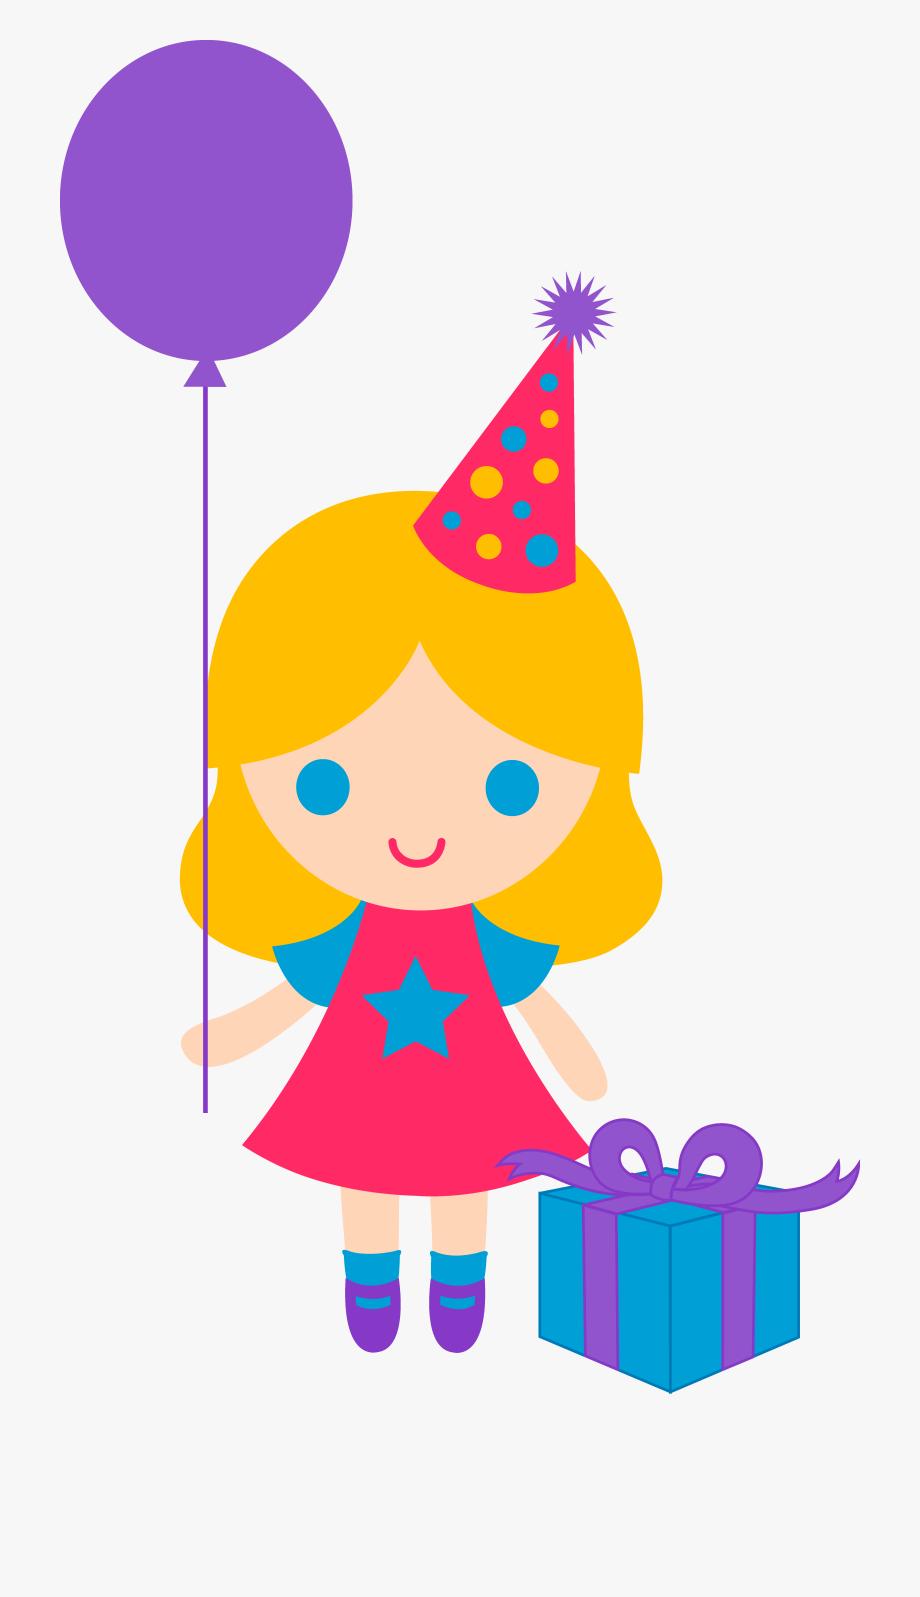 Free Birthday Balloon Clip Art Clipart Panda.